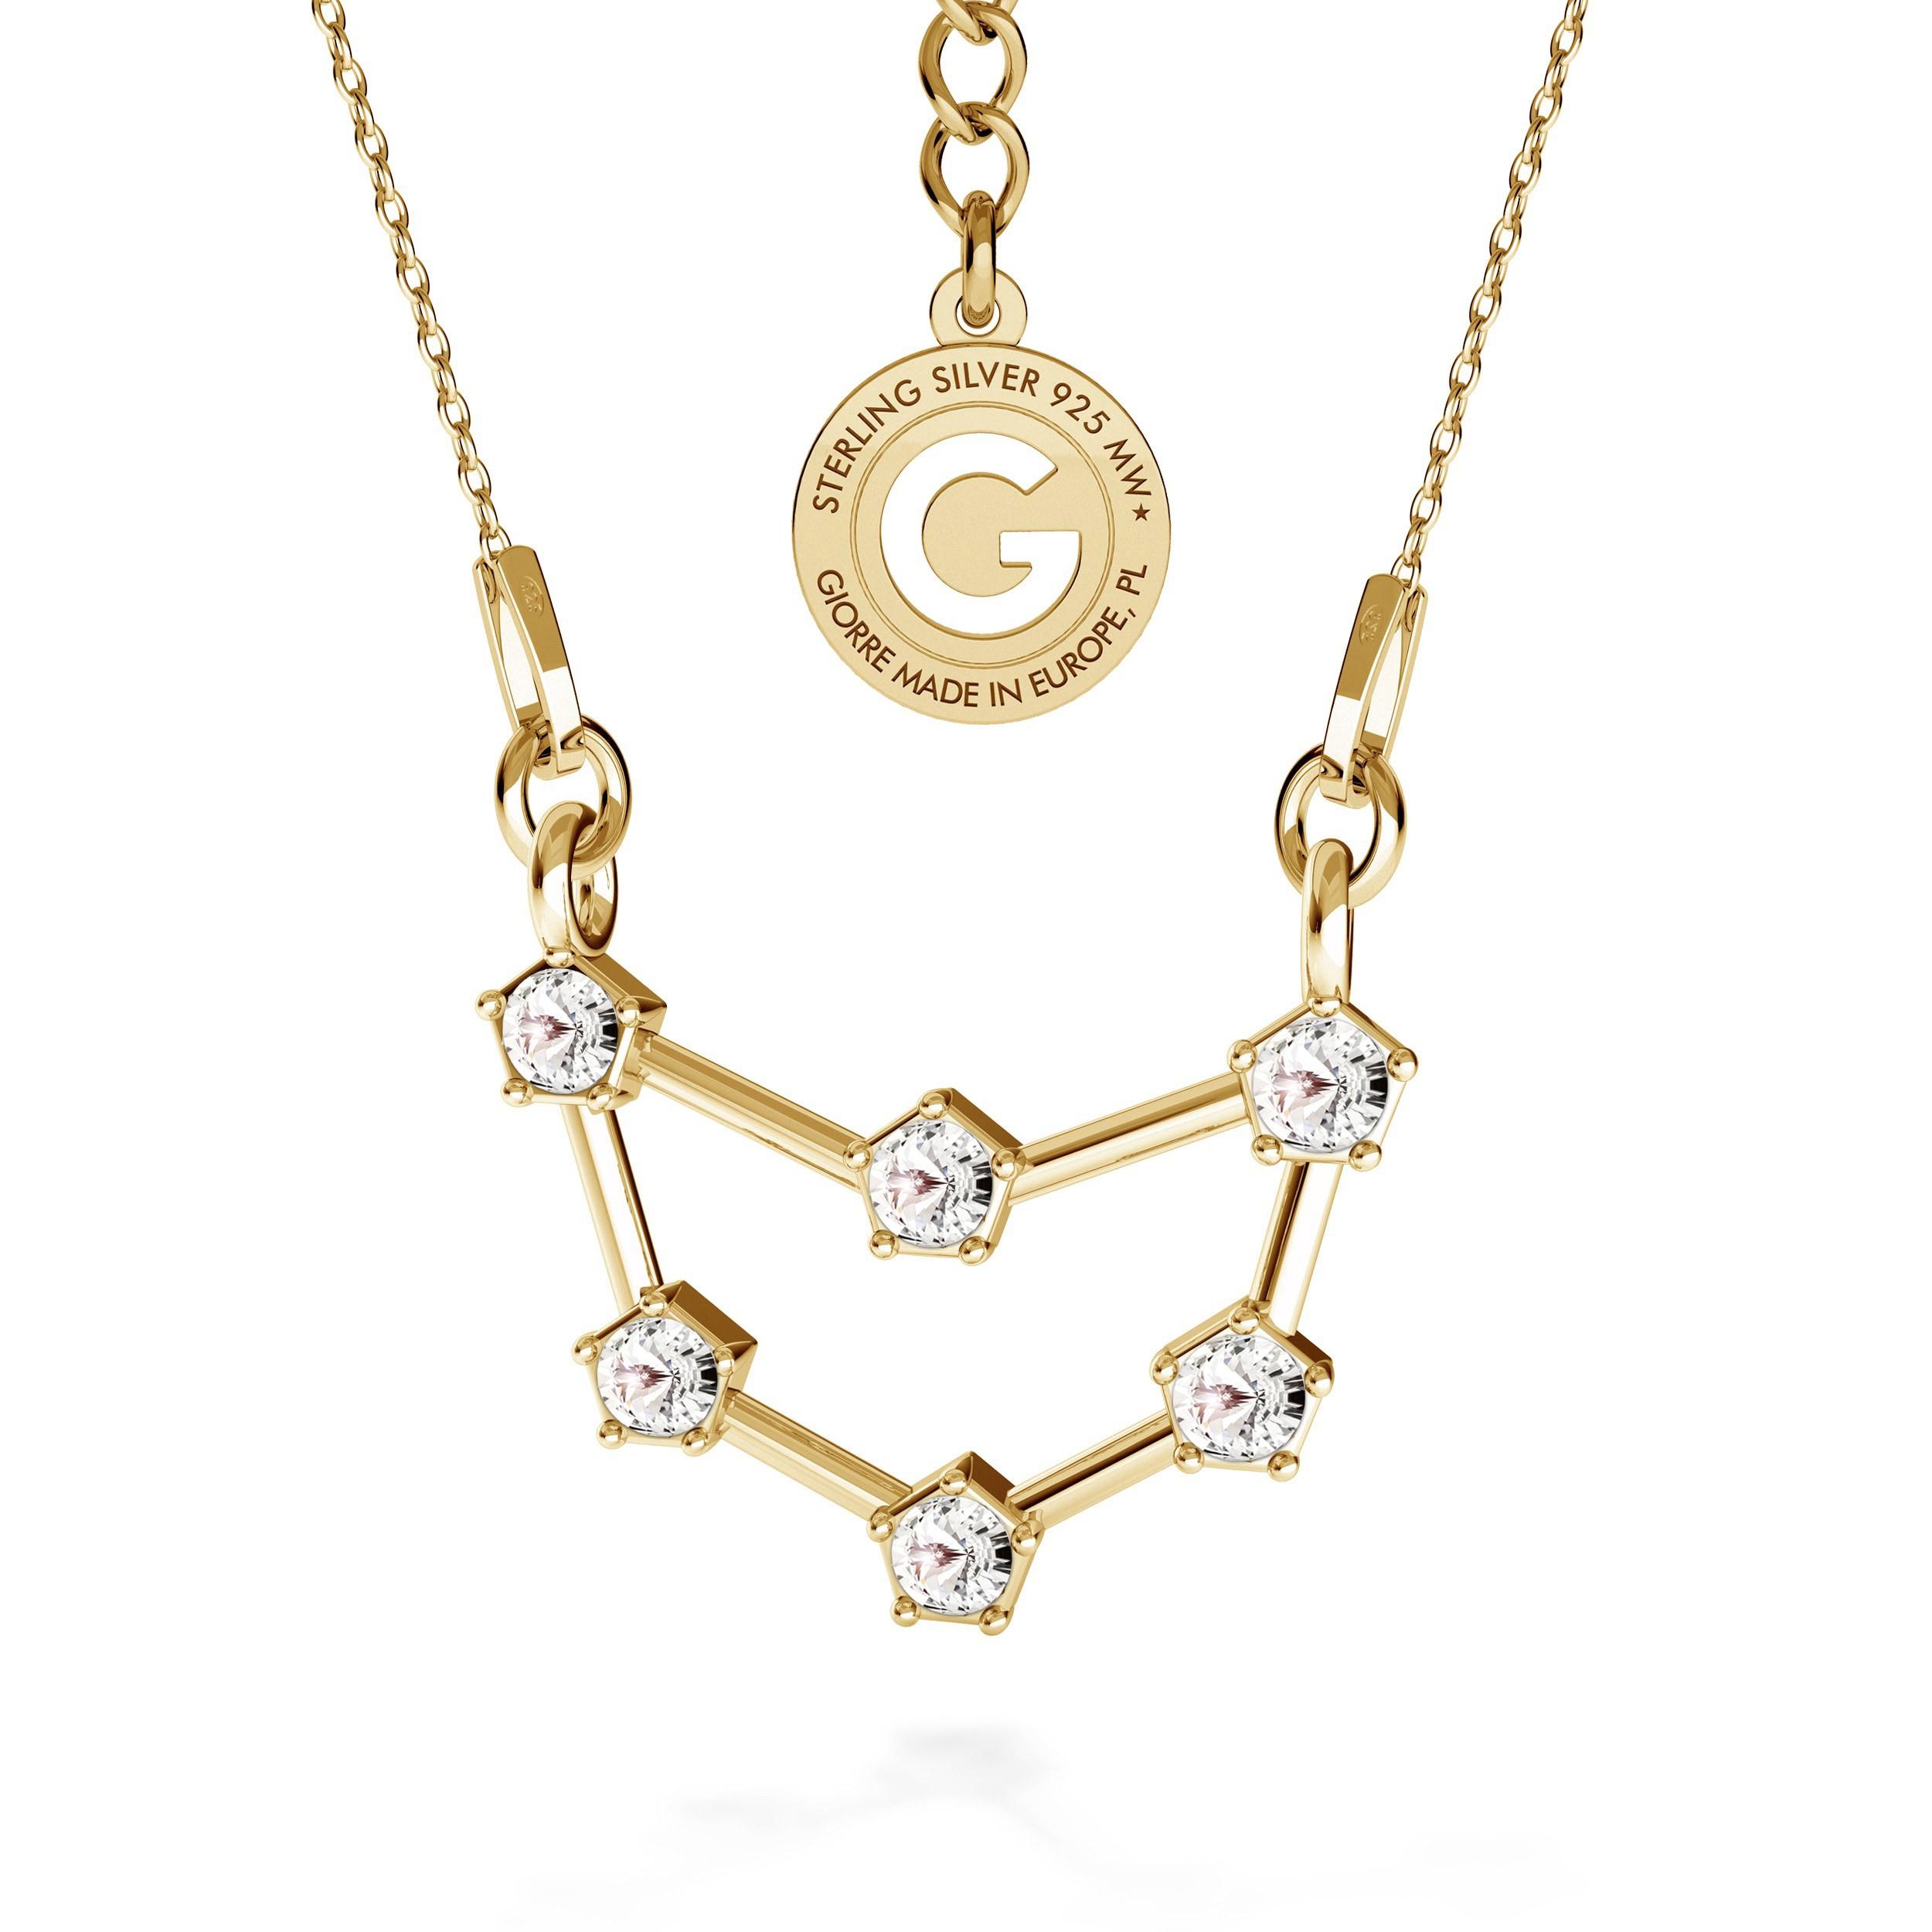 CAPRICORN zodiac sign necklace with Swarovski Crystals silver 925